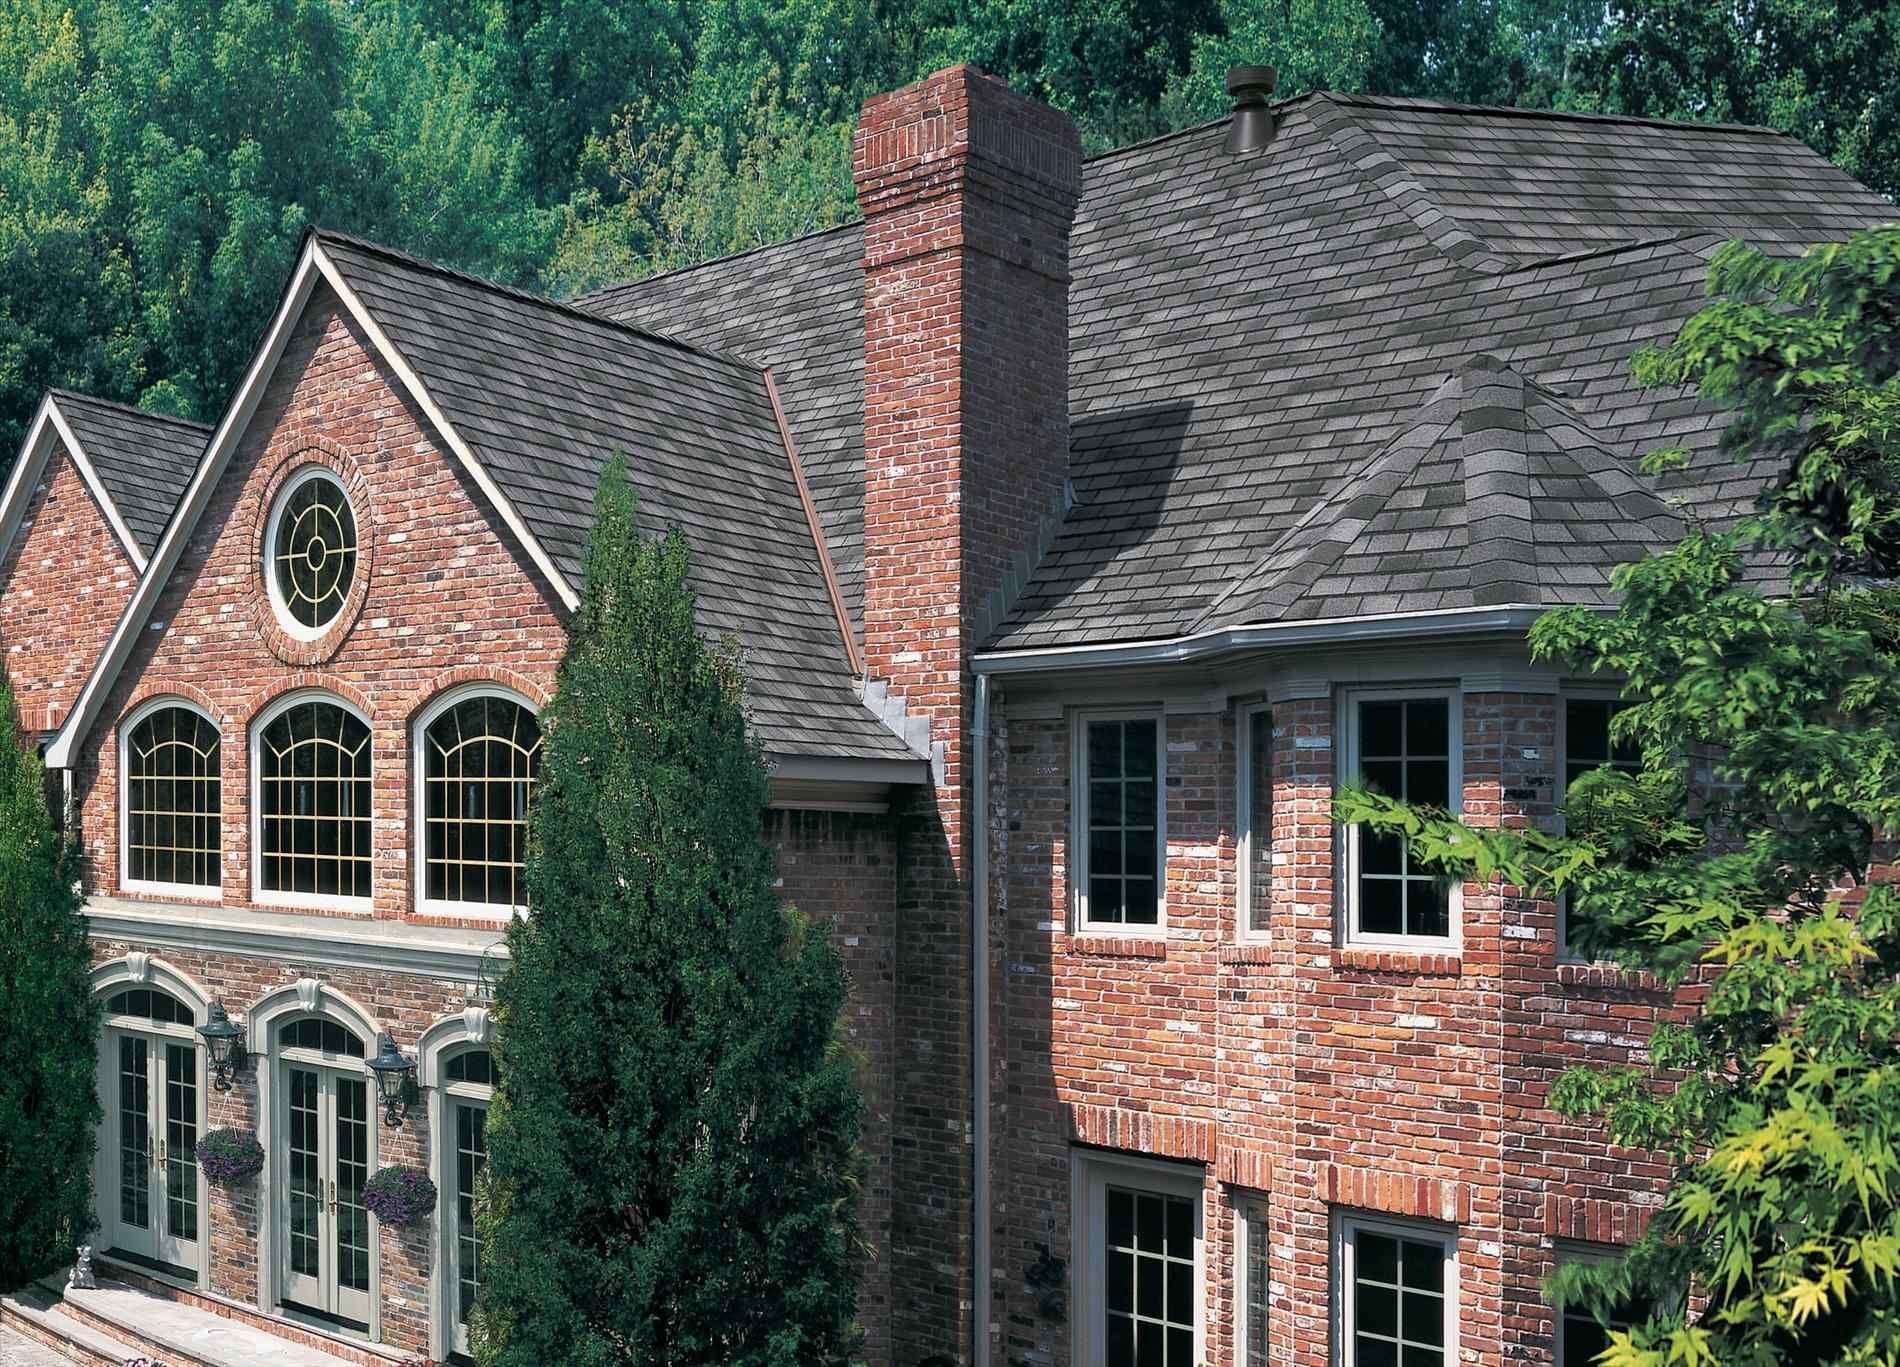 Best Victorian Roof Shingles Asphalt Roof Shingles Roof 400 x 300